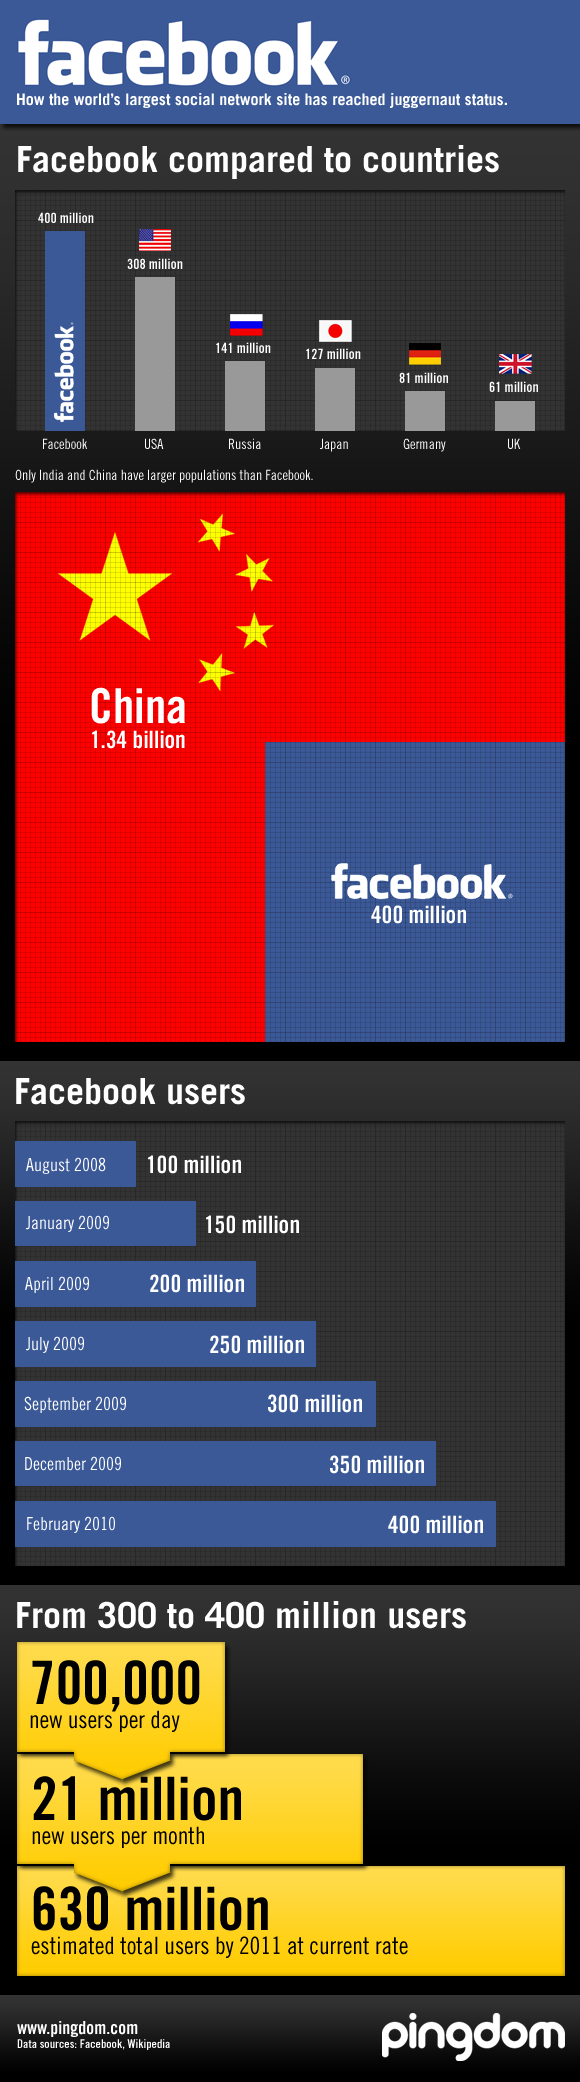 Facebook, social media juggernaut (infographic) - Pingdom Royal